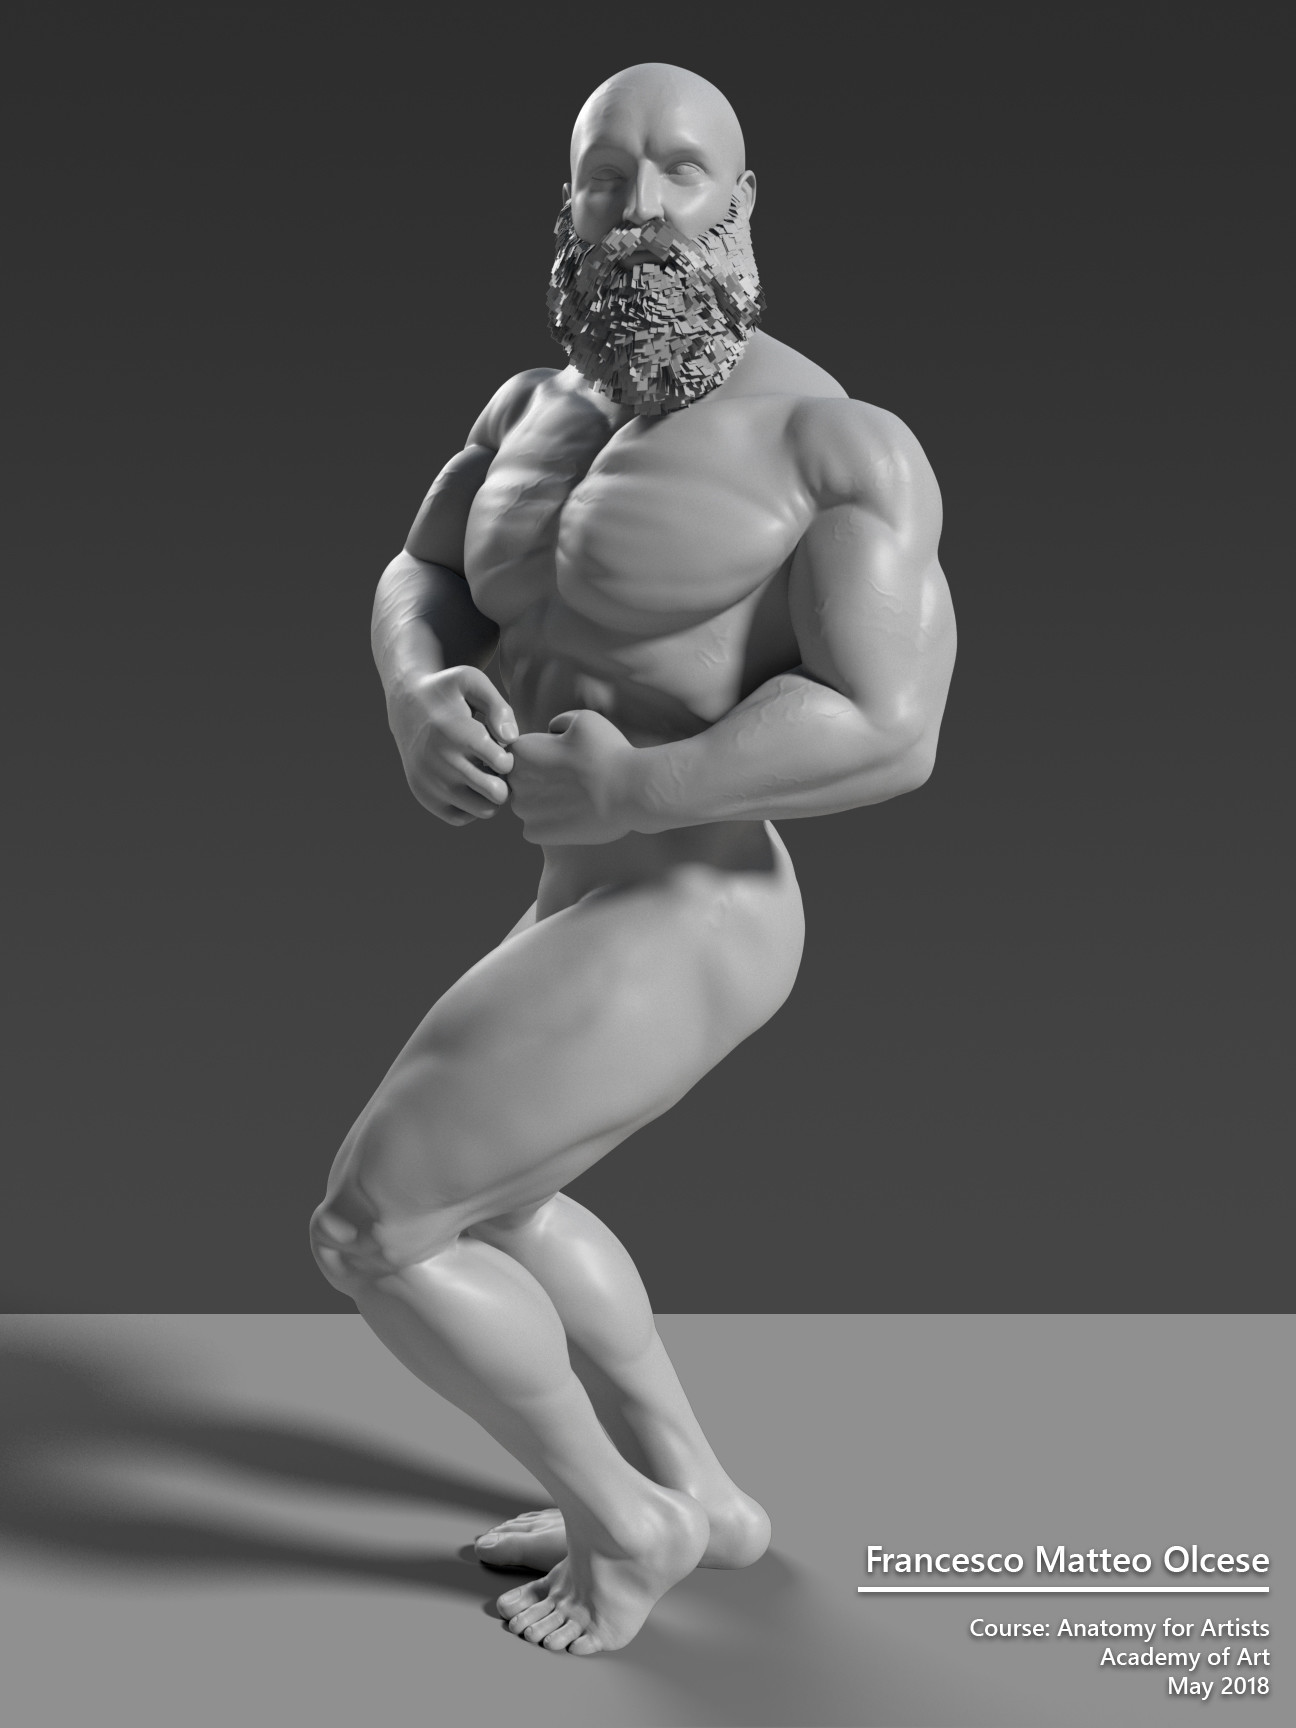 Francesco Matteo Olcese - Male Anatomy Study 02